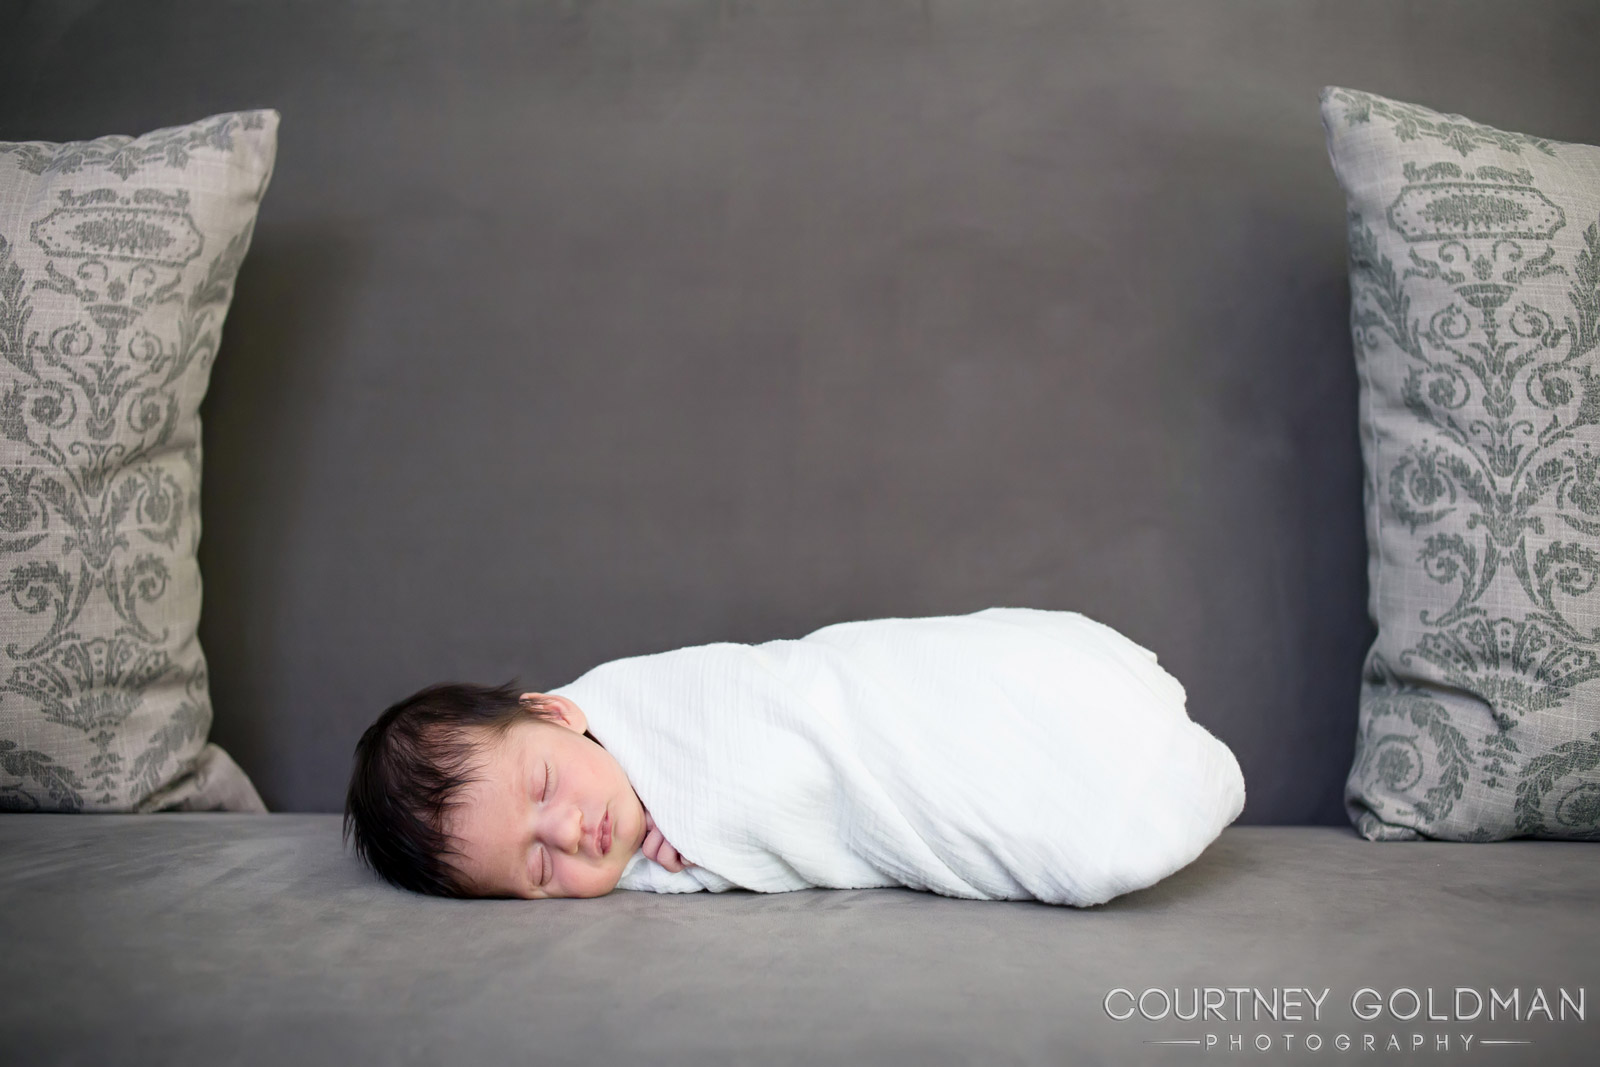 Atlanta Maternity and Newborn Photography by Courtney Goldman 17.jpg